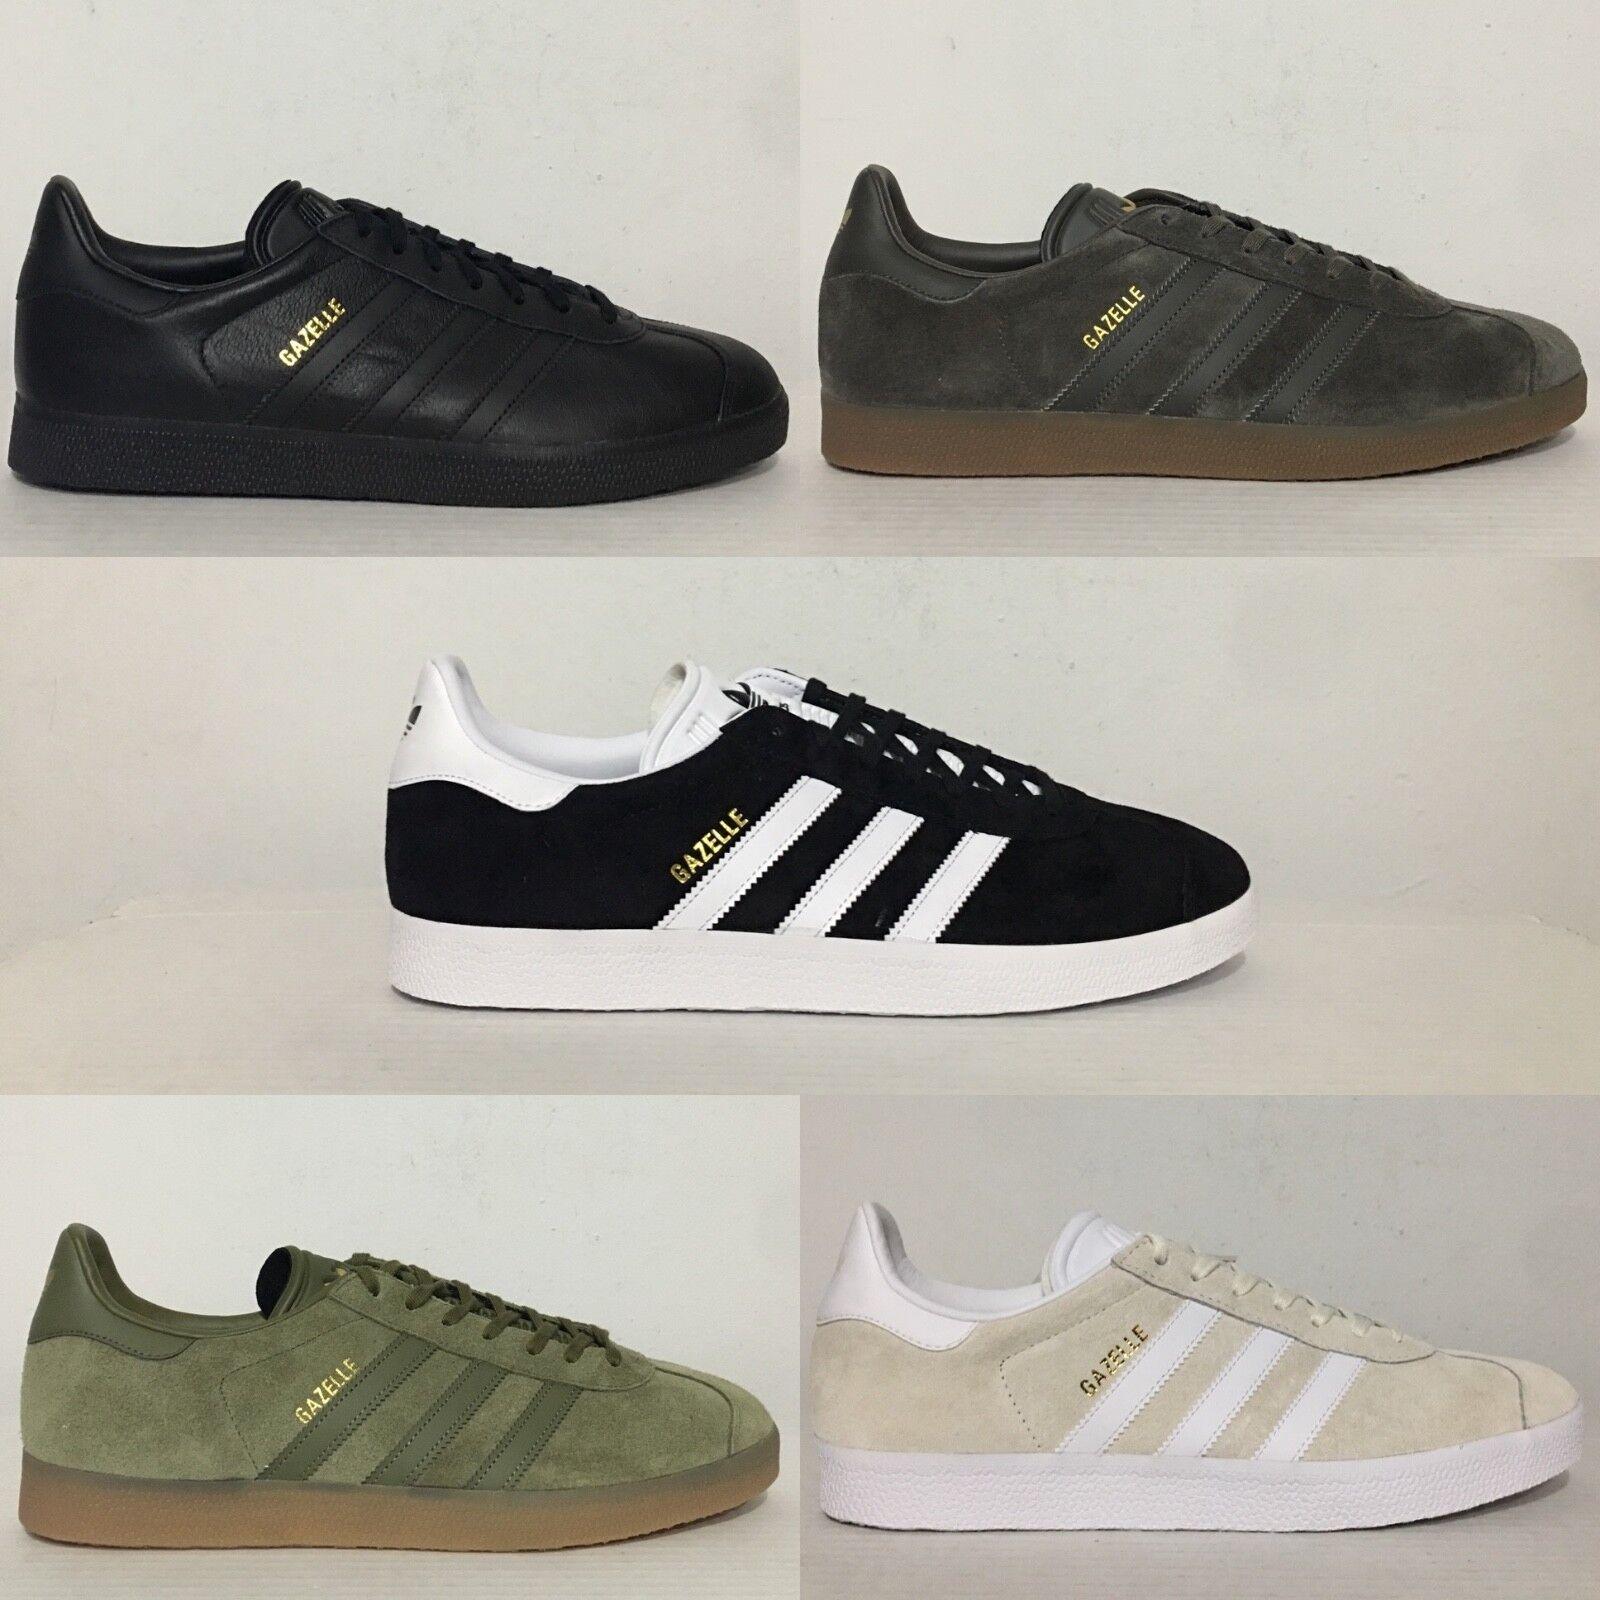 Adidas Original Gazellen Klassische Retro Turnschuhe